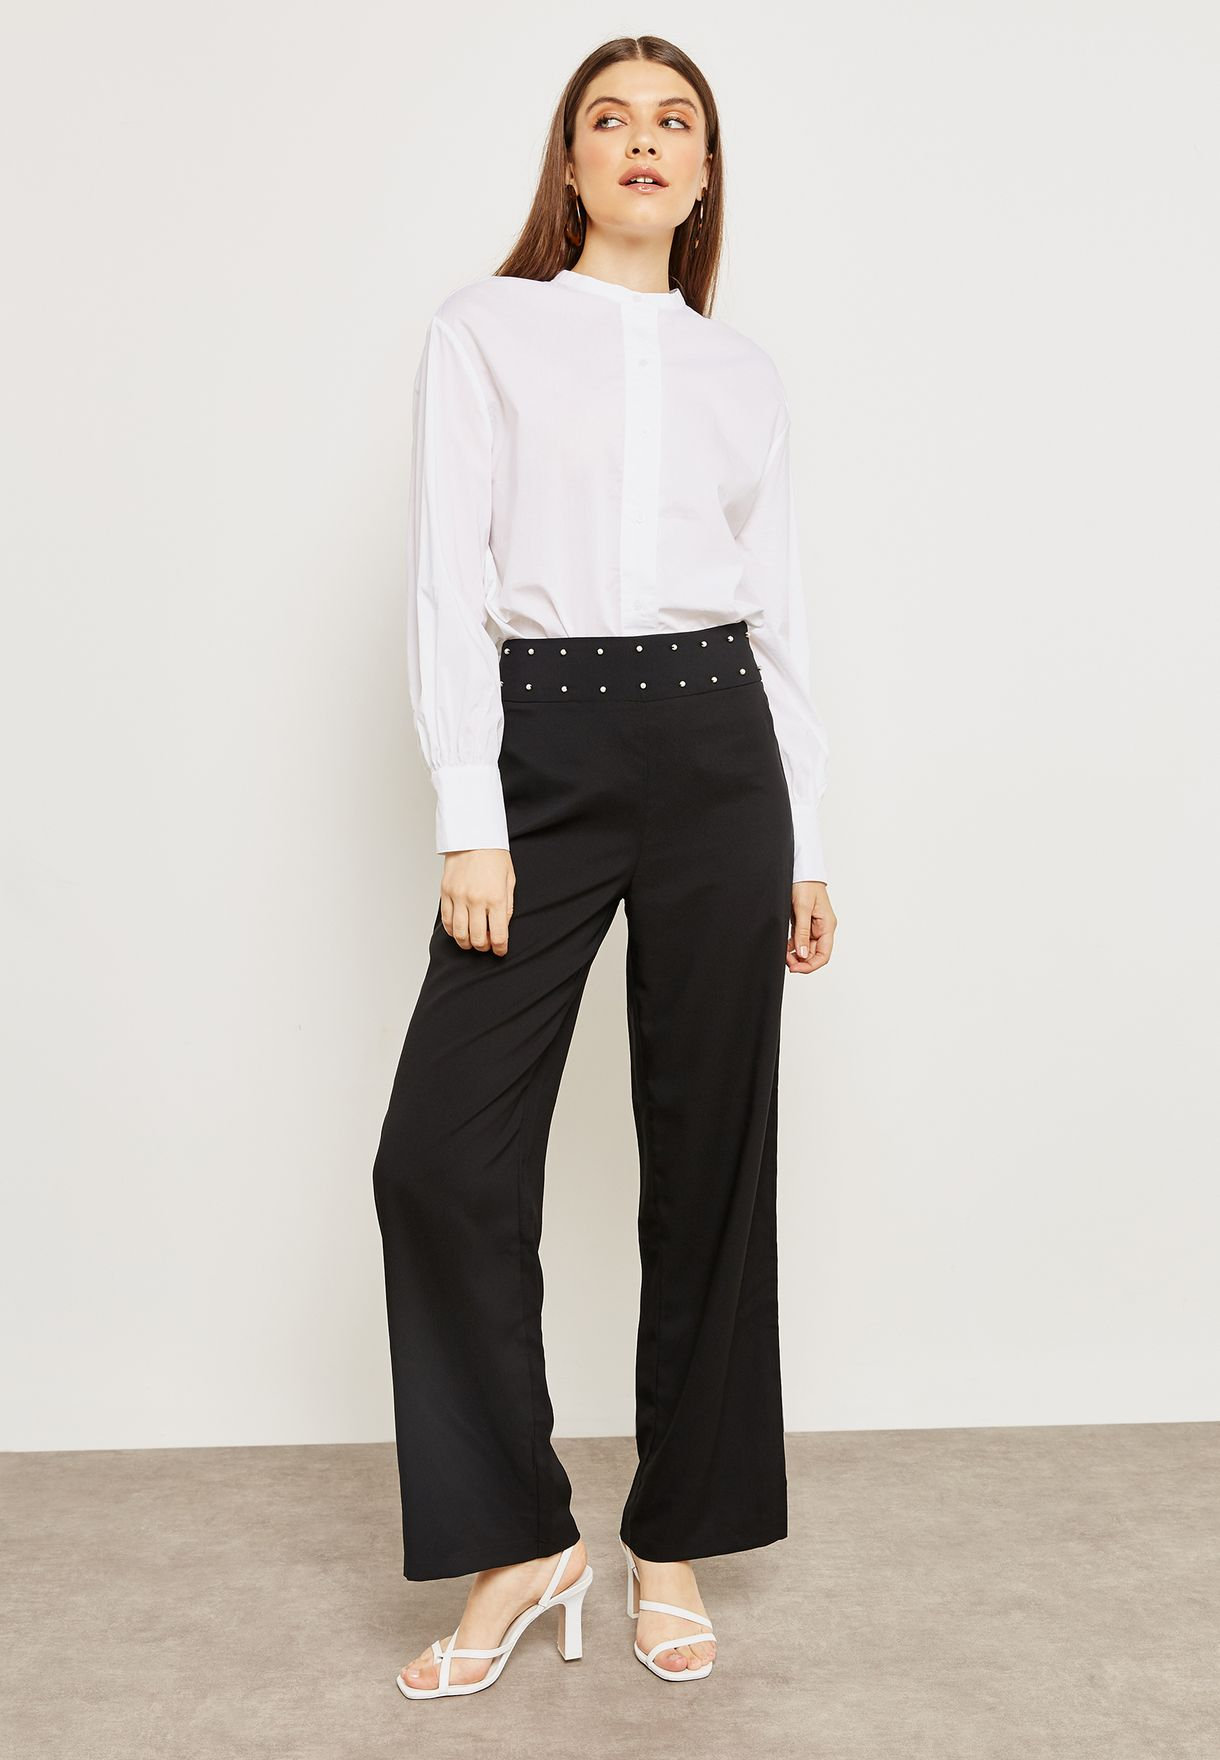 Pearl Embellished Pants